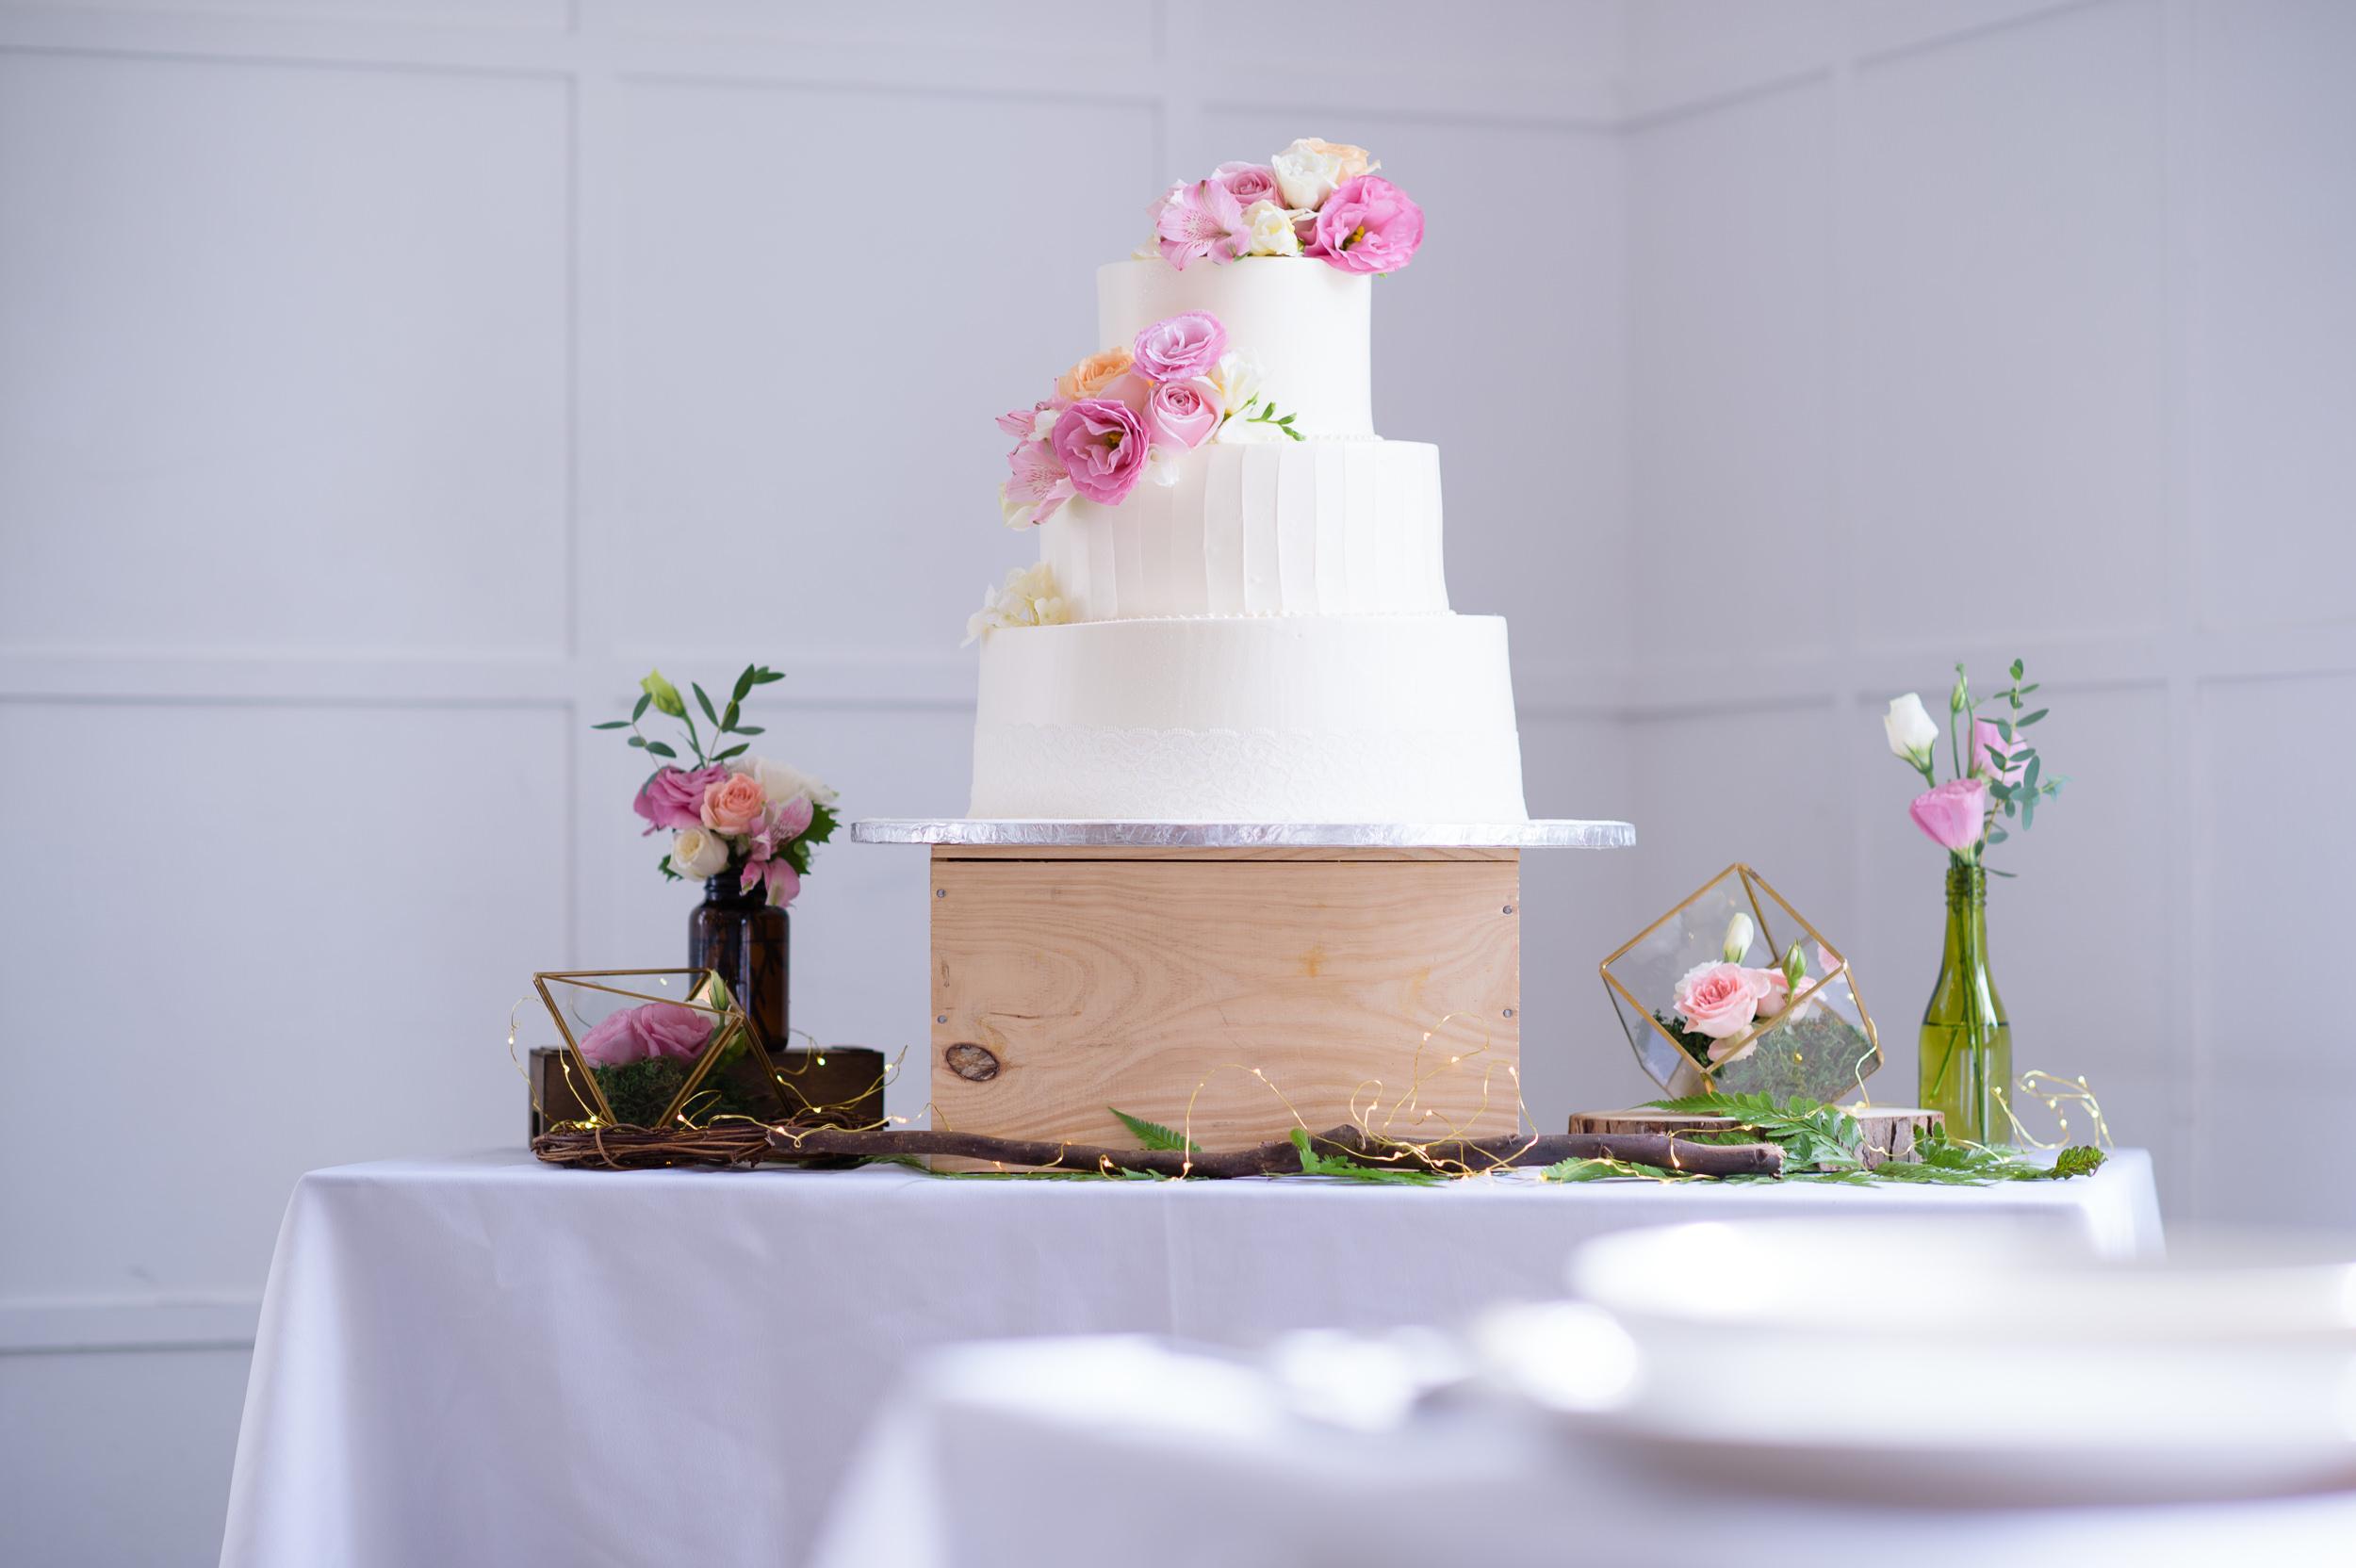 ROM Wedding Cake Bokelicious Photography